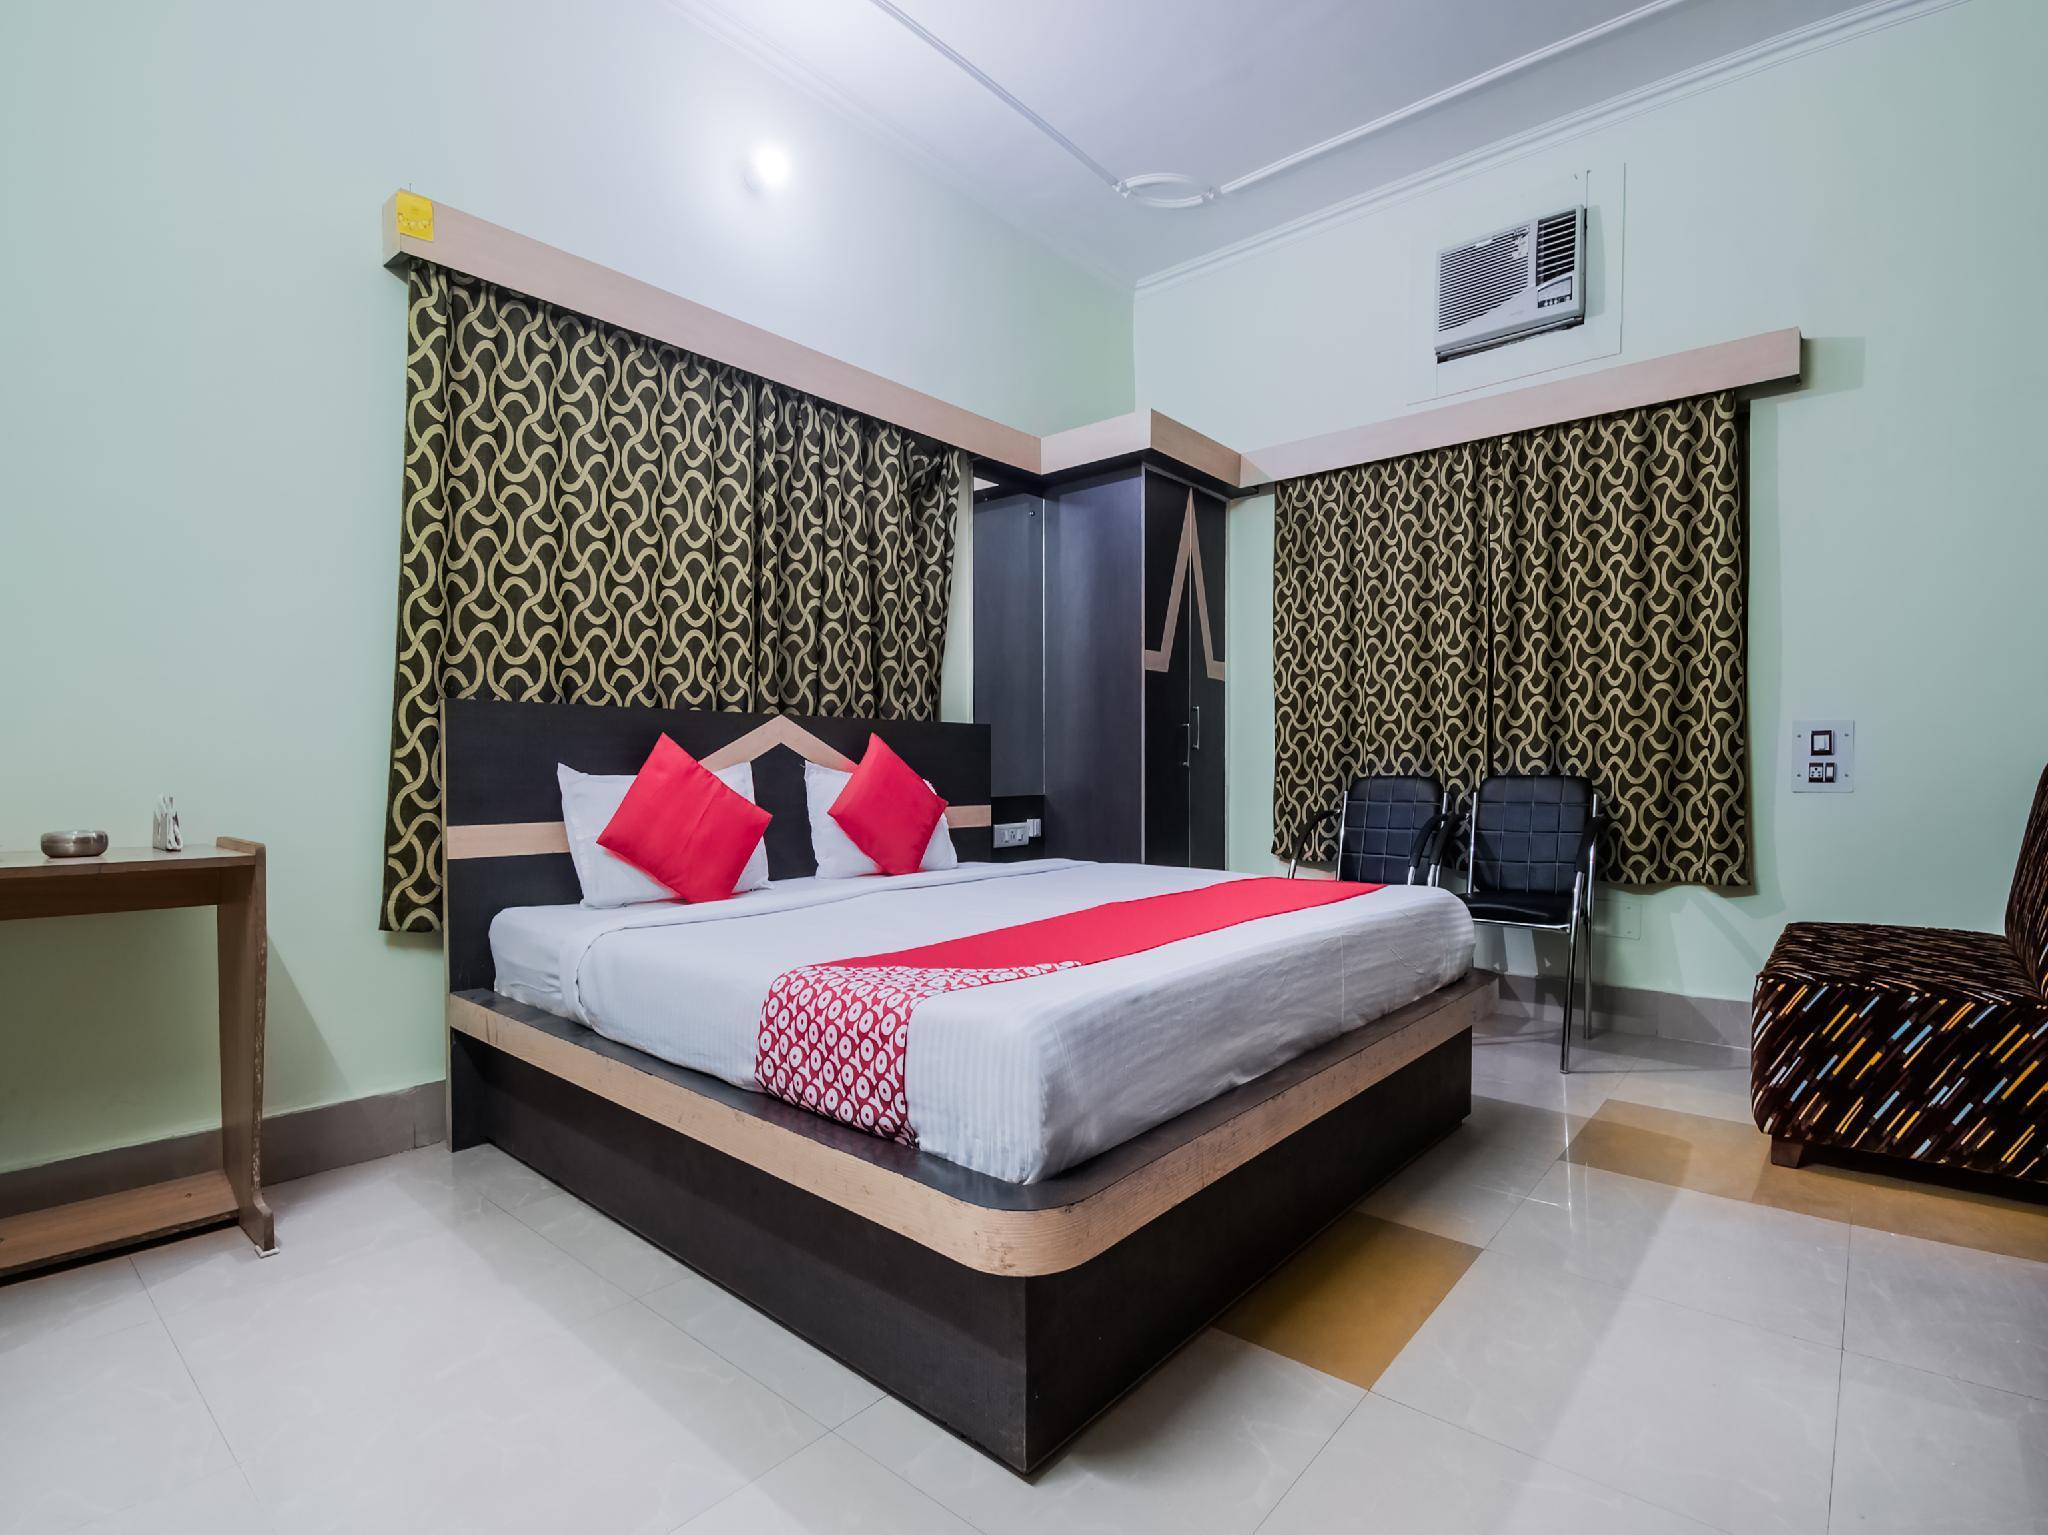 OYO 27688 Hotel Chandralok Continental, Muzaffarpur